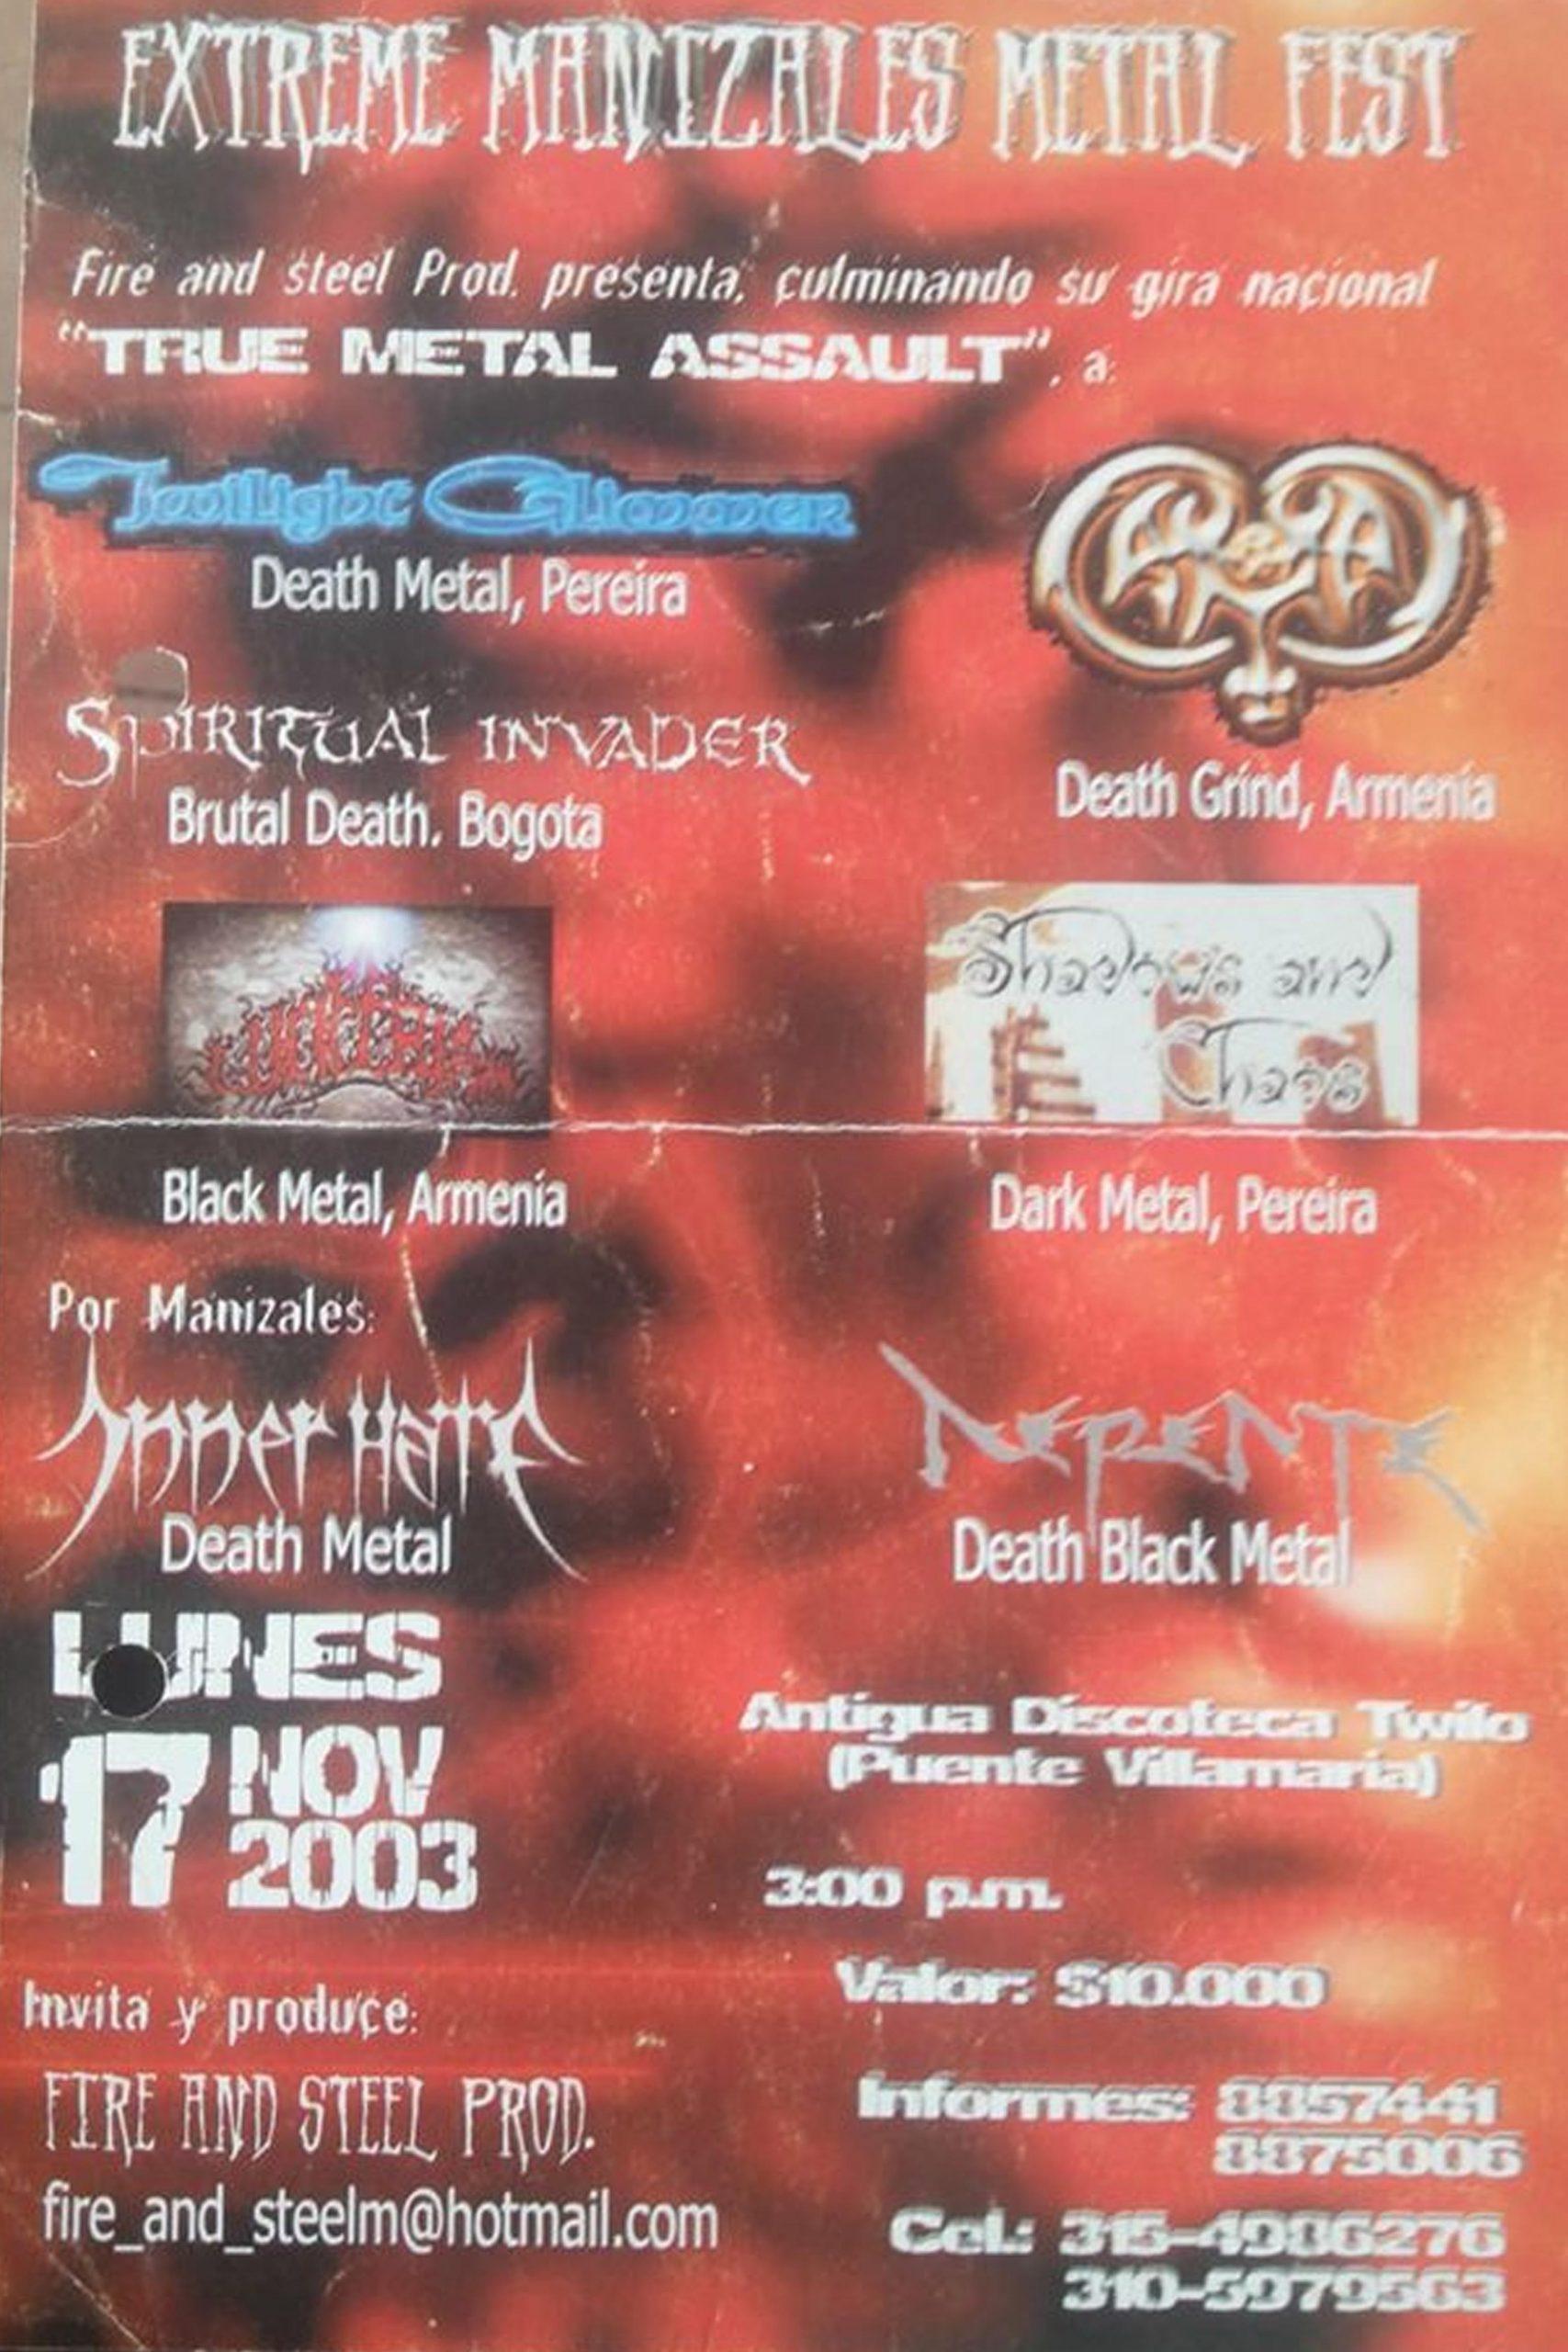 Extreme Manizales Metal Fest